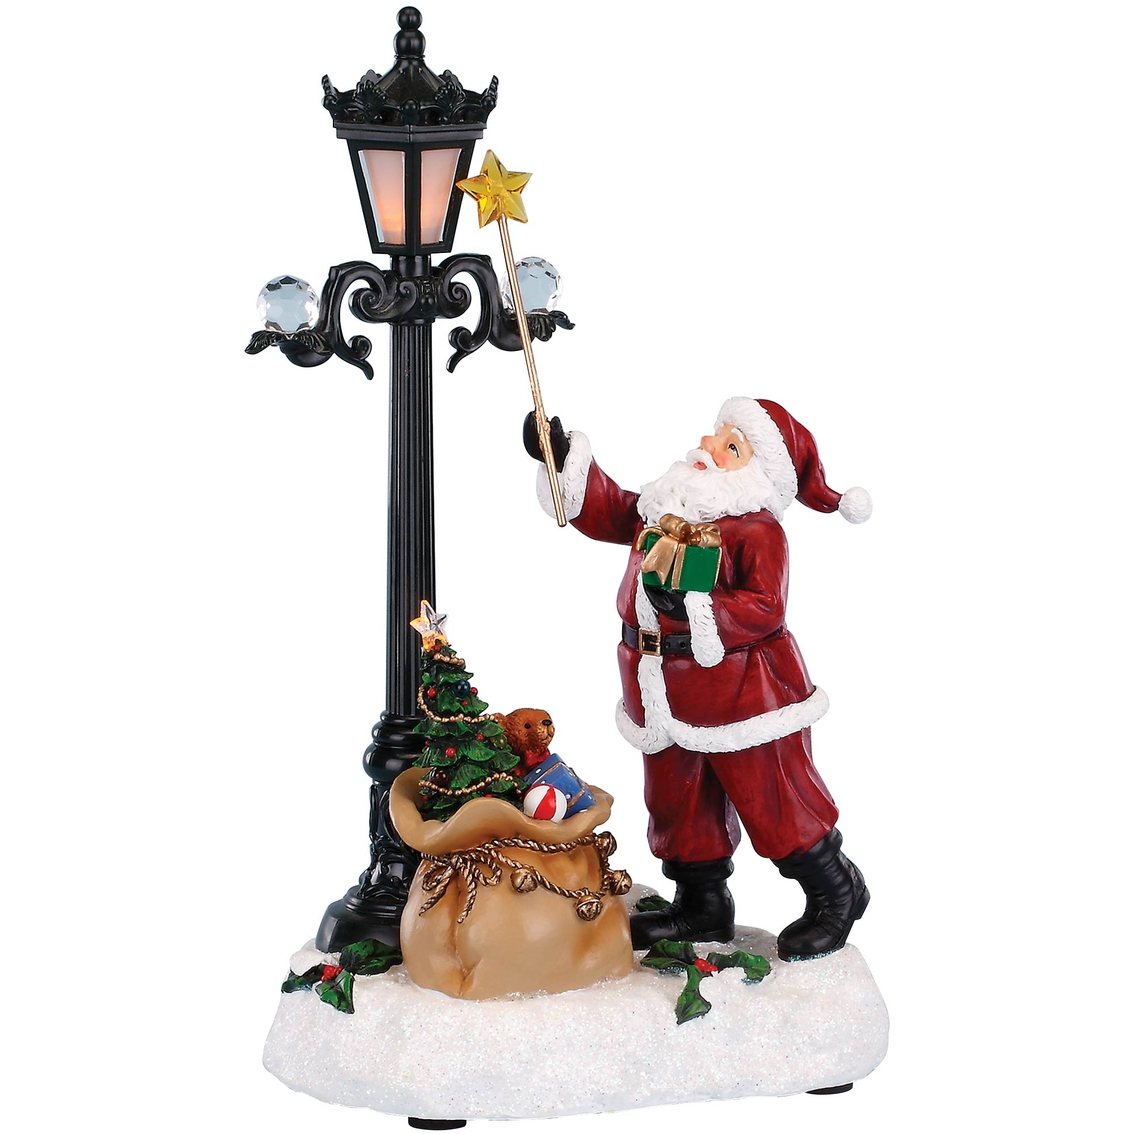 Roman musical light up santa lighting lamp figurine